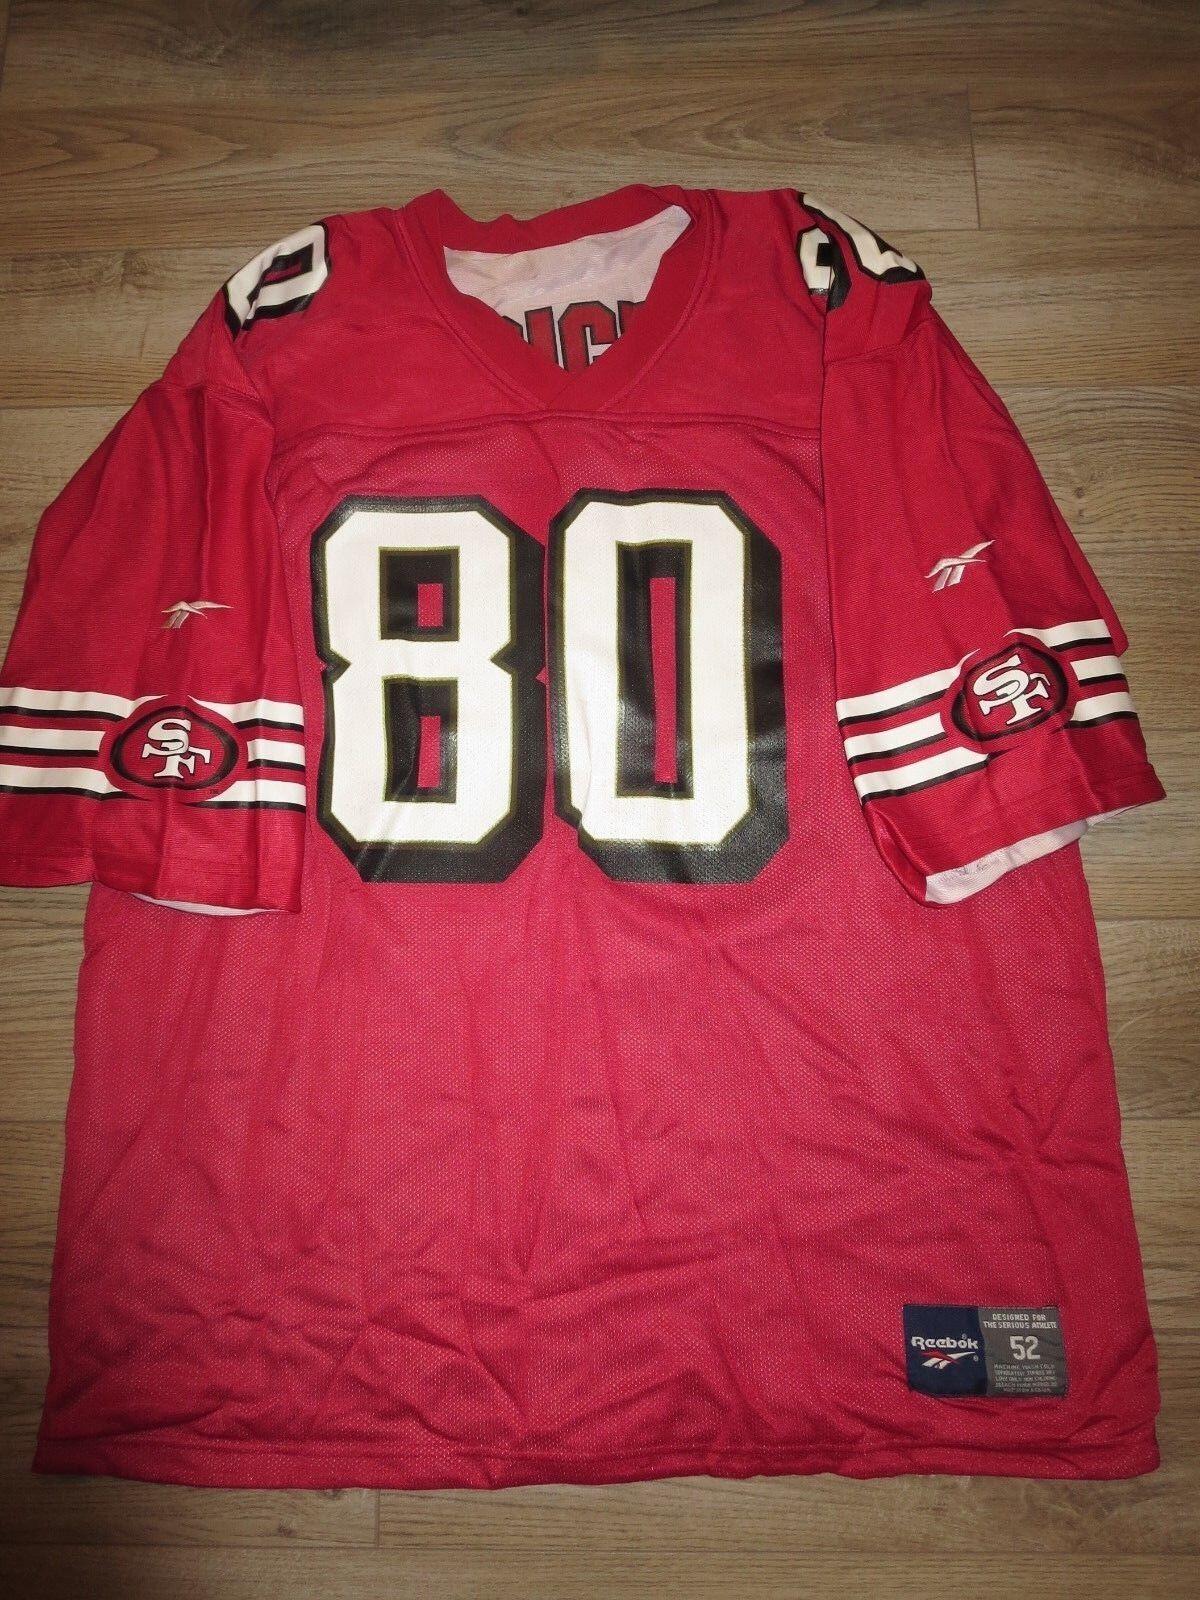 Jerry Rice San Francisco 49ers Reebok NFL Super Bowl Reversible Camiseta 52